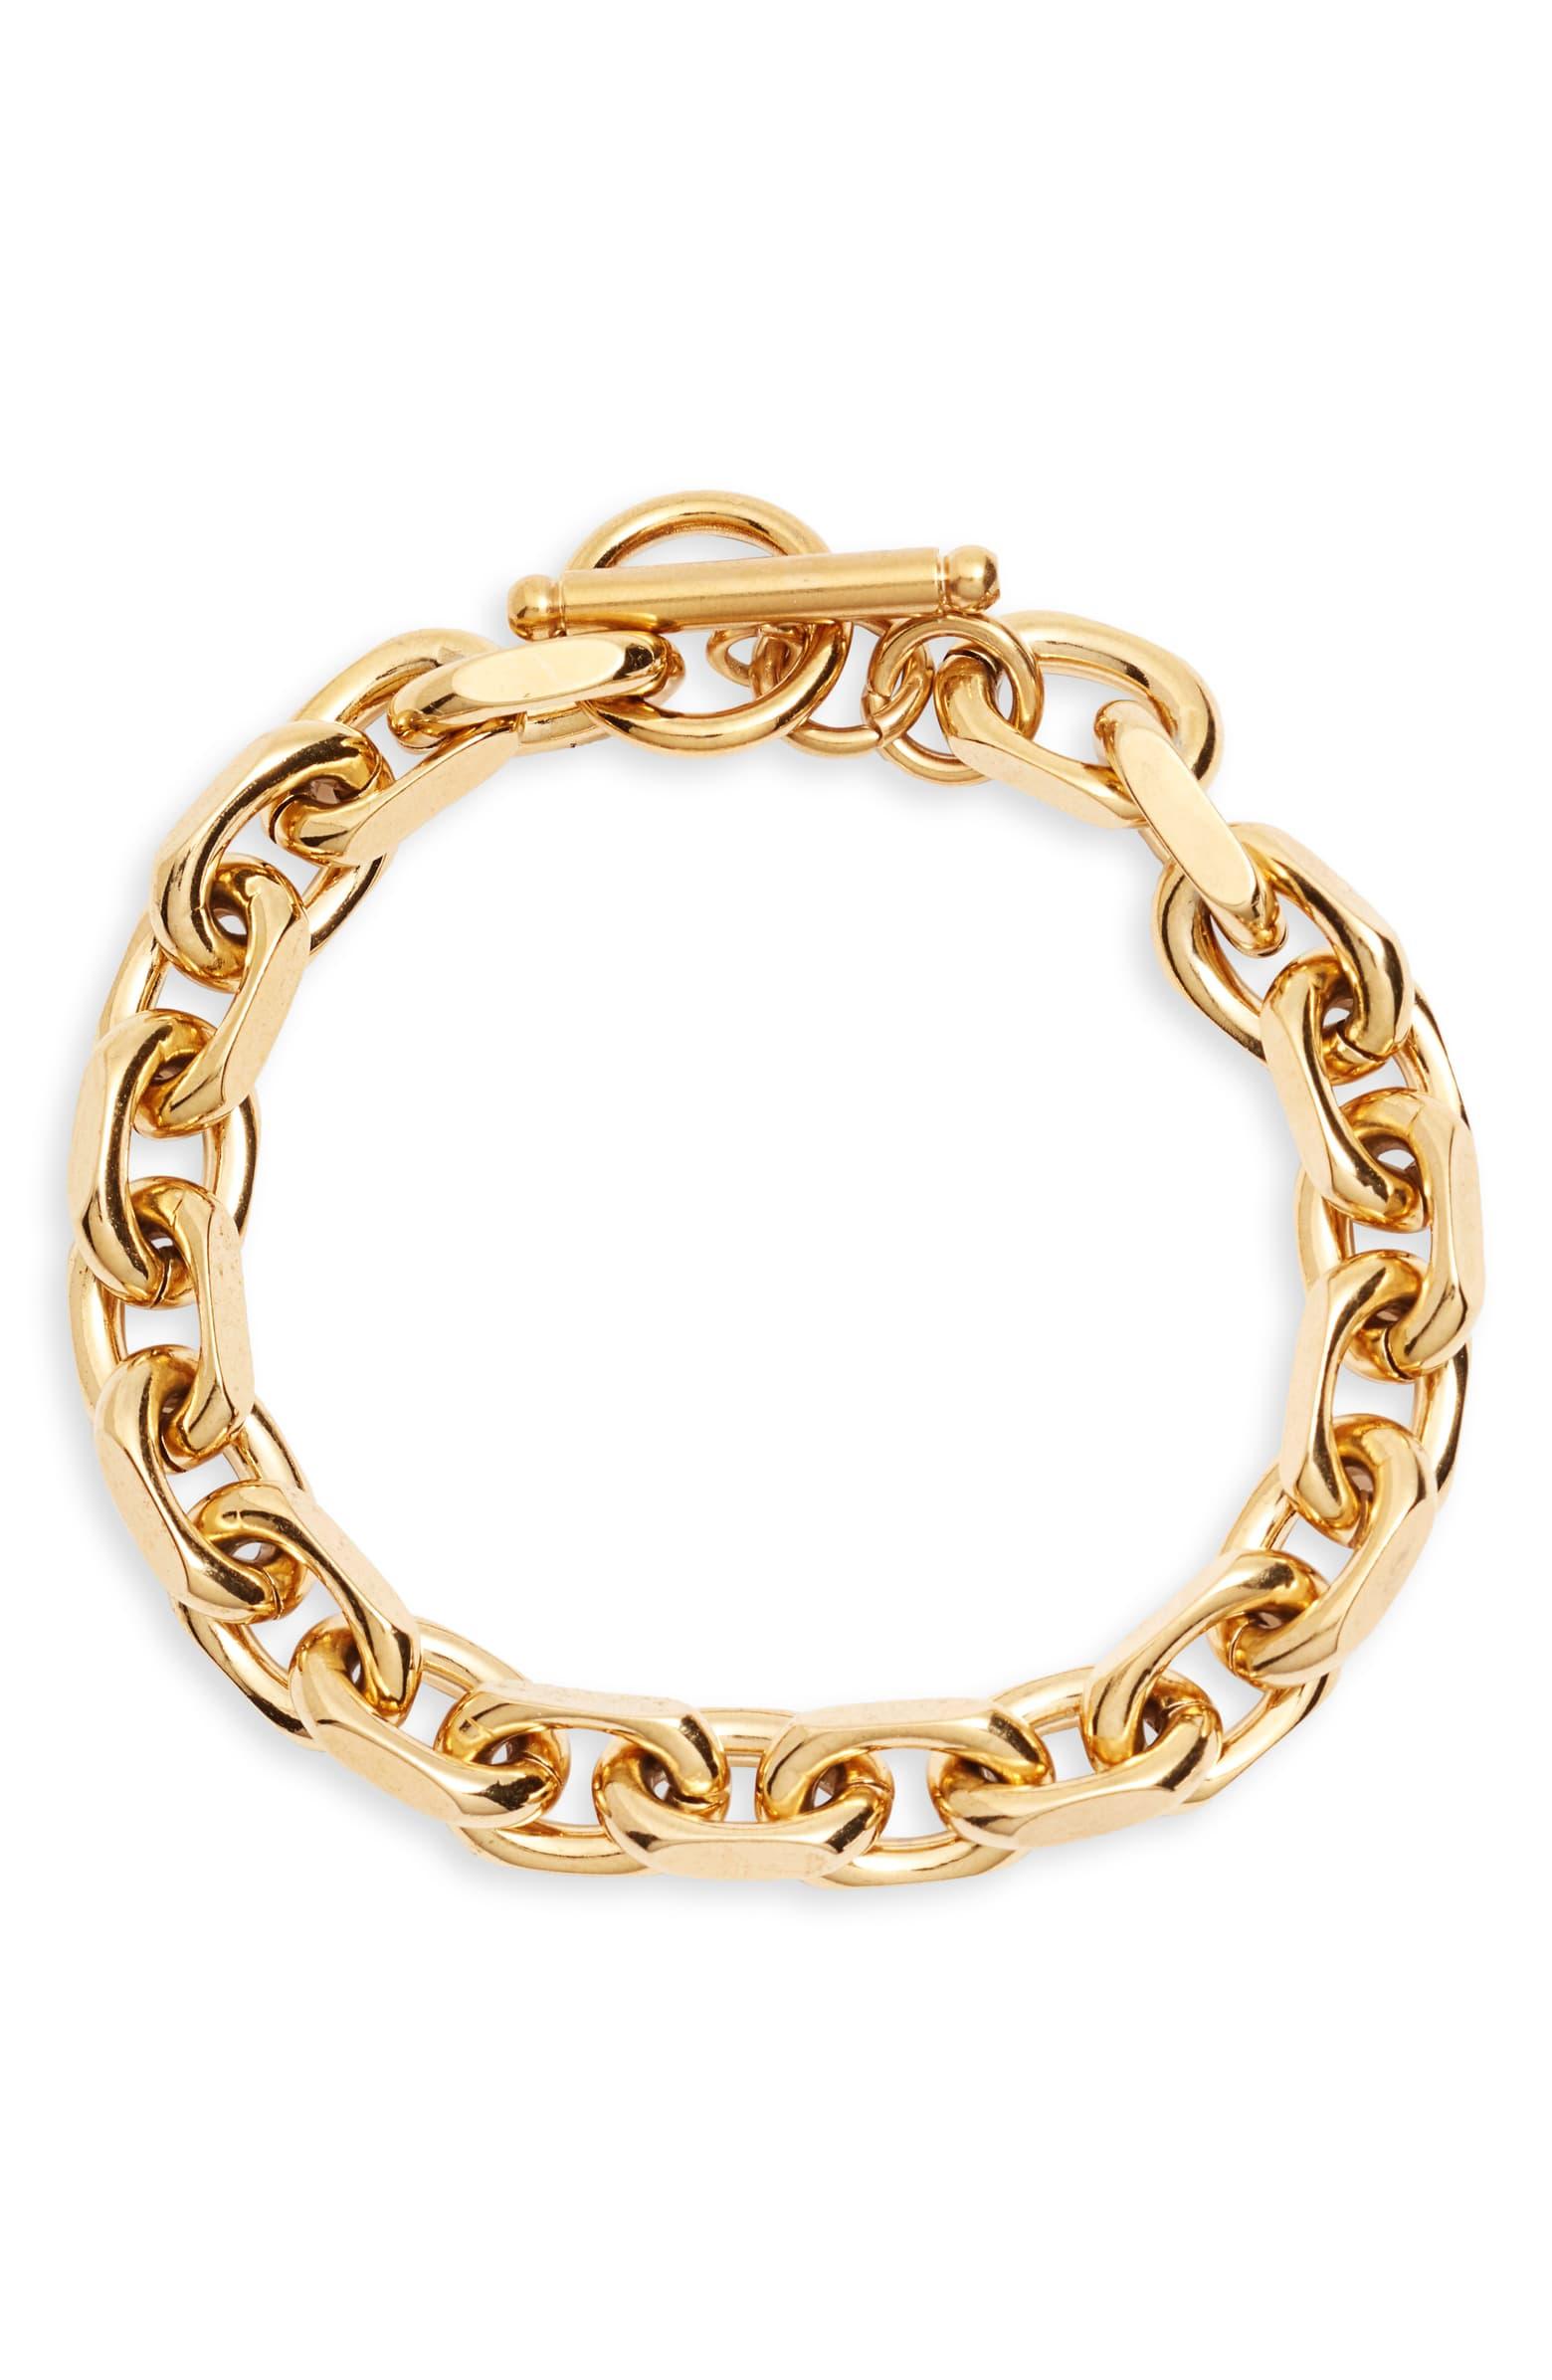 ELLIE VAIL Maddox Gold Toggle Bracelet